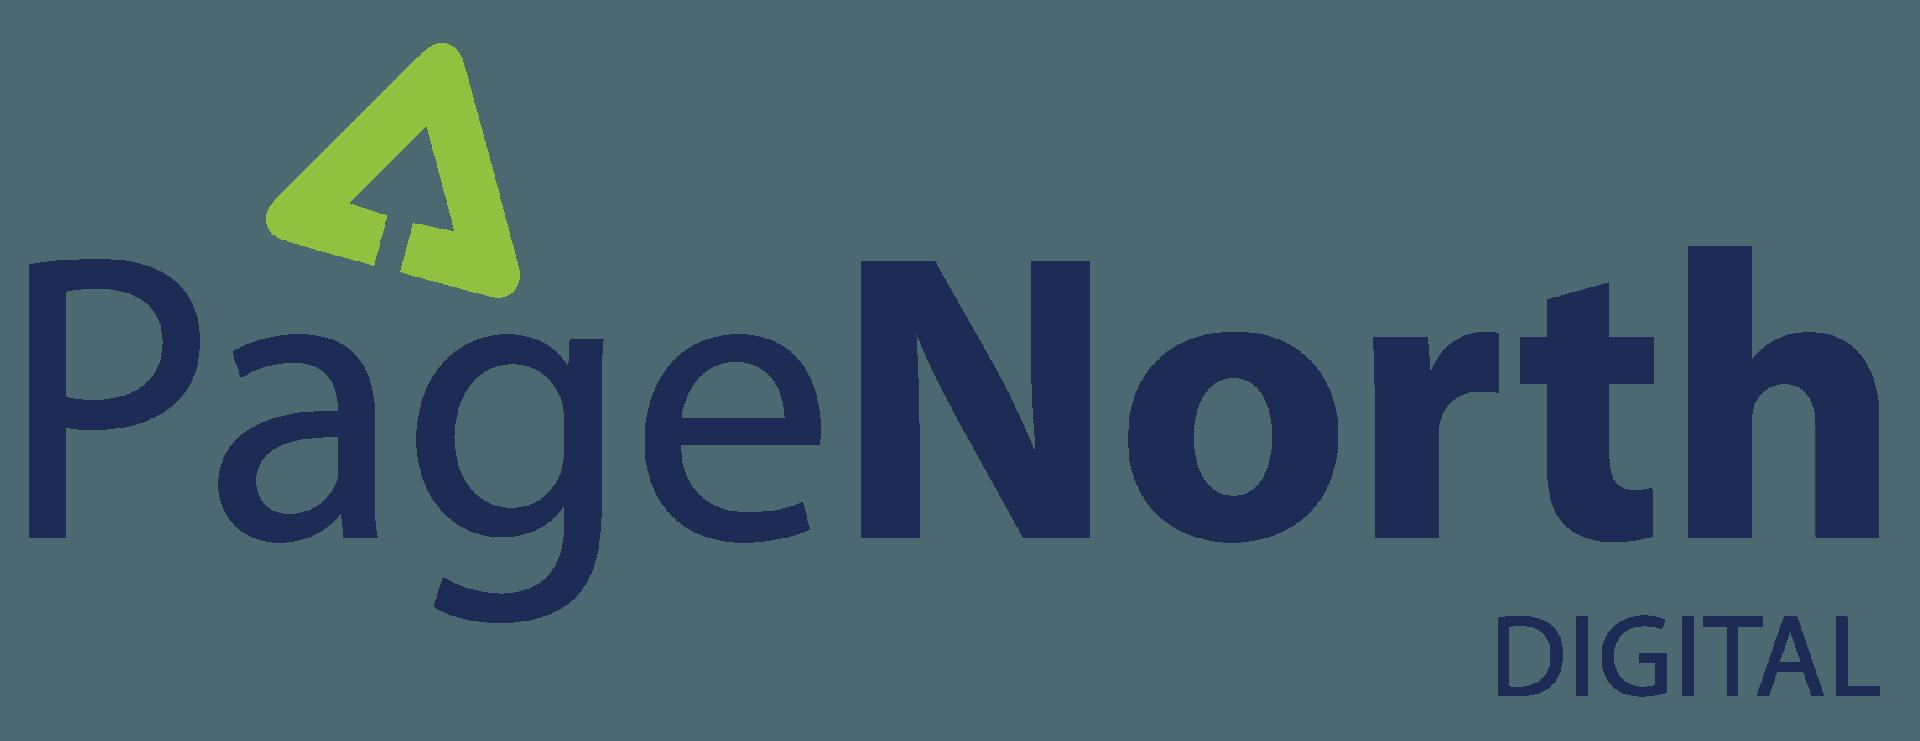 PageNorth Digital